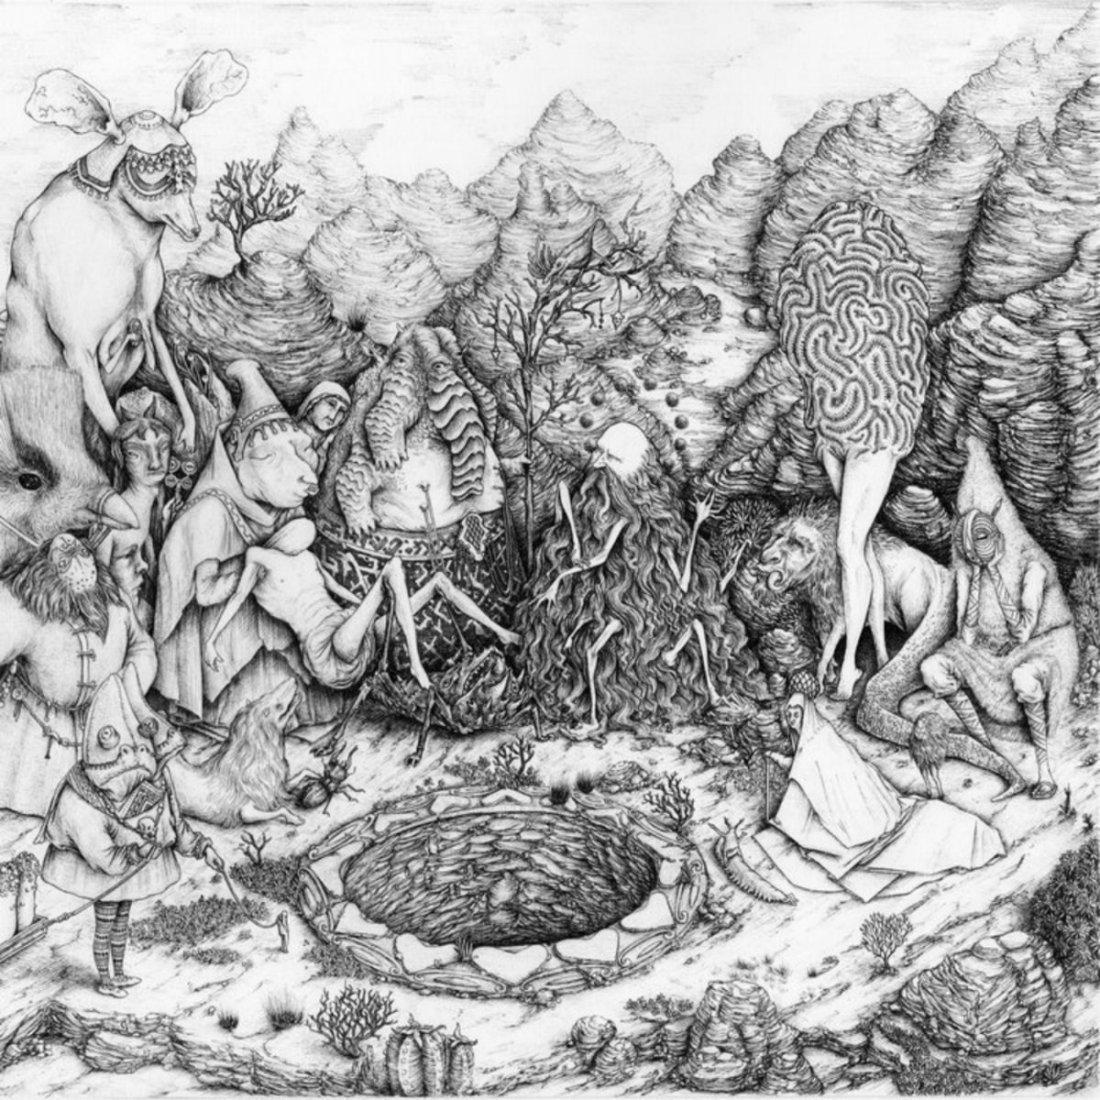 hellkeeper_a_world_within_flesh